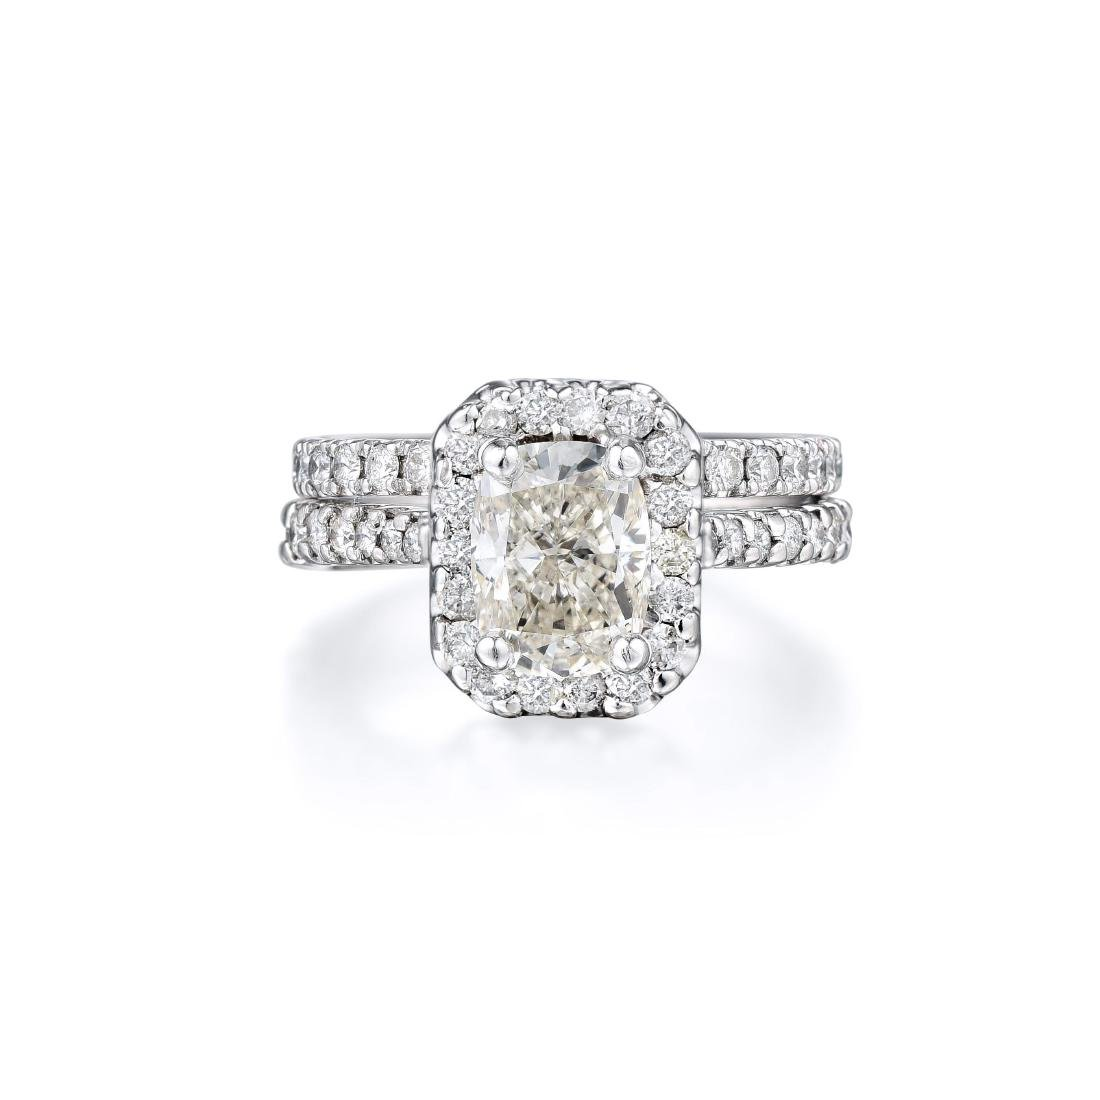 A 1.45-Carat Cushion-cut Diamond Ring Bridal Set